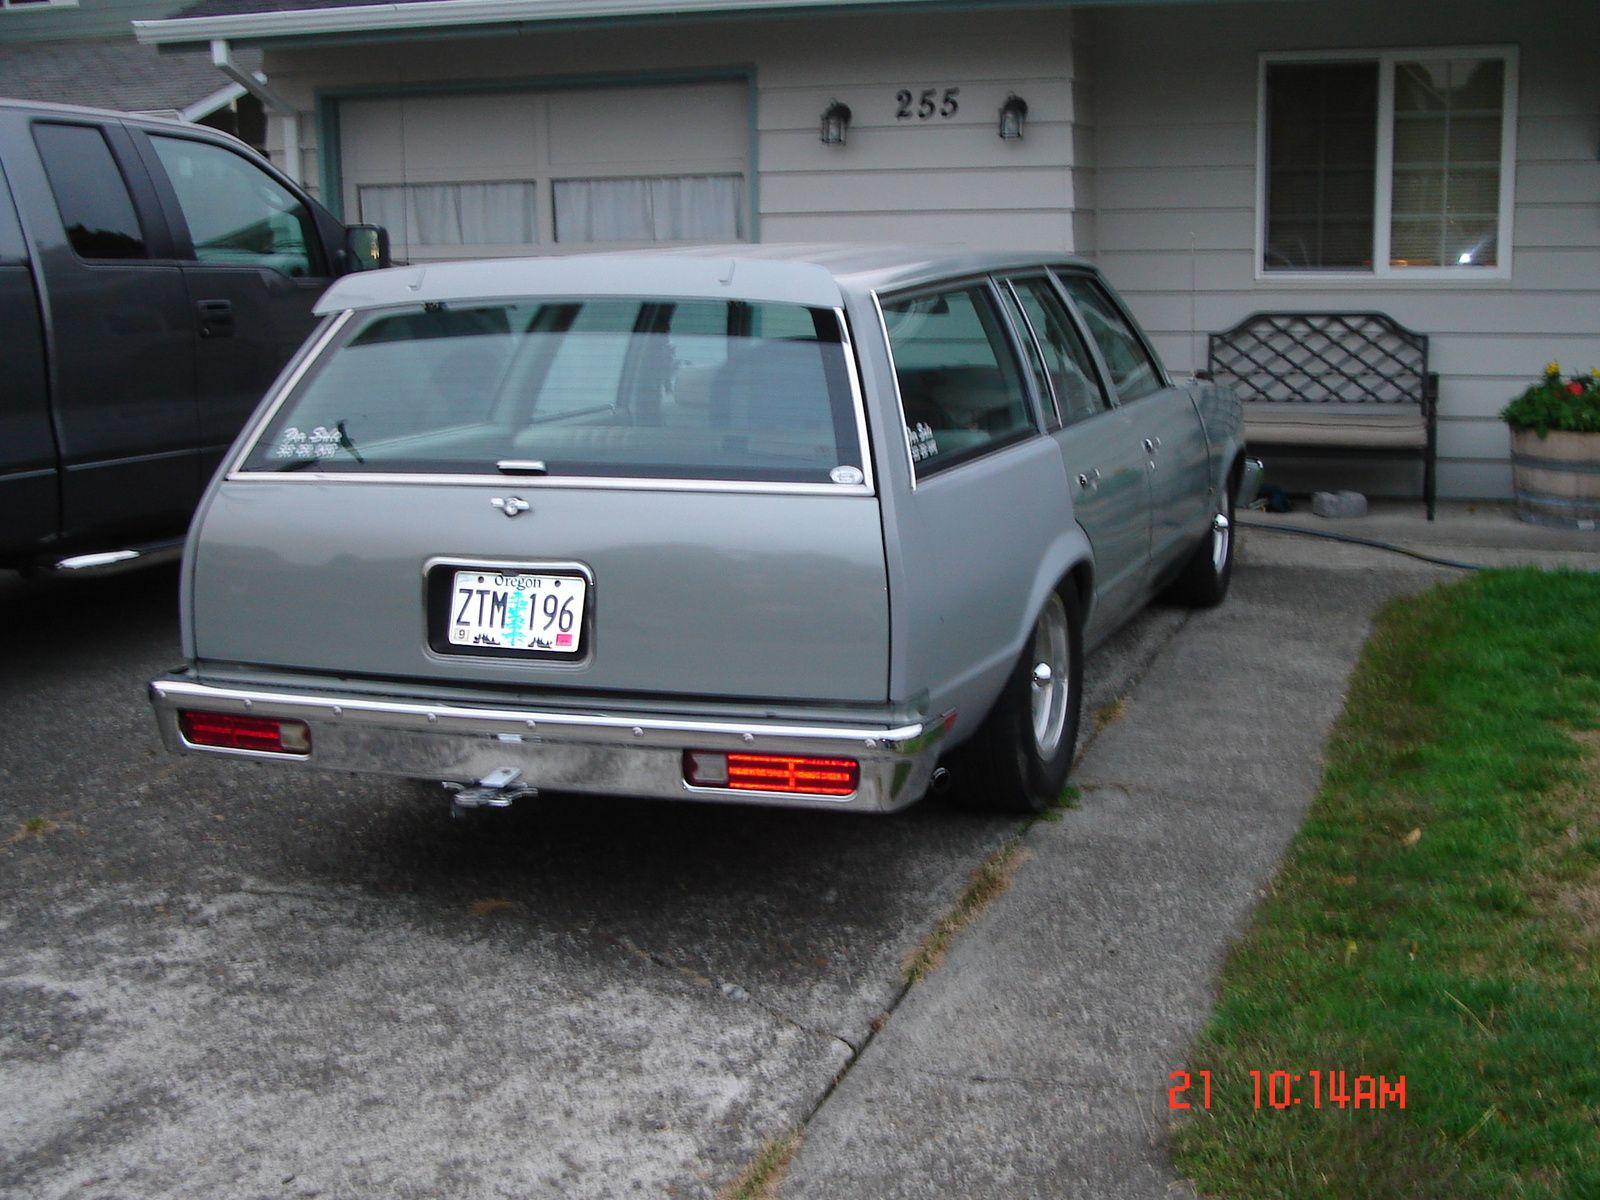 1983 Chevy Malibu Chevy Malibu Chevrolet Malibu Chevrolet